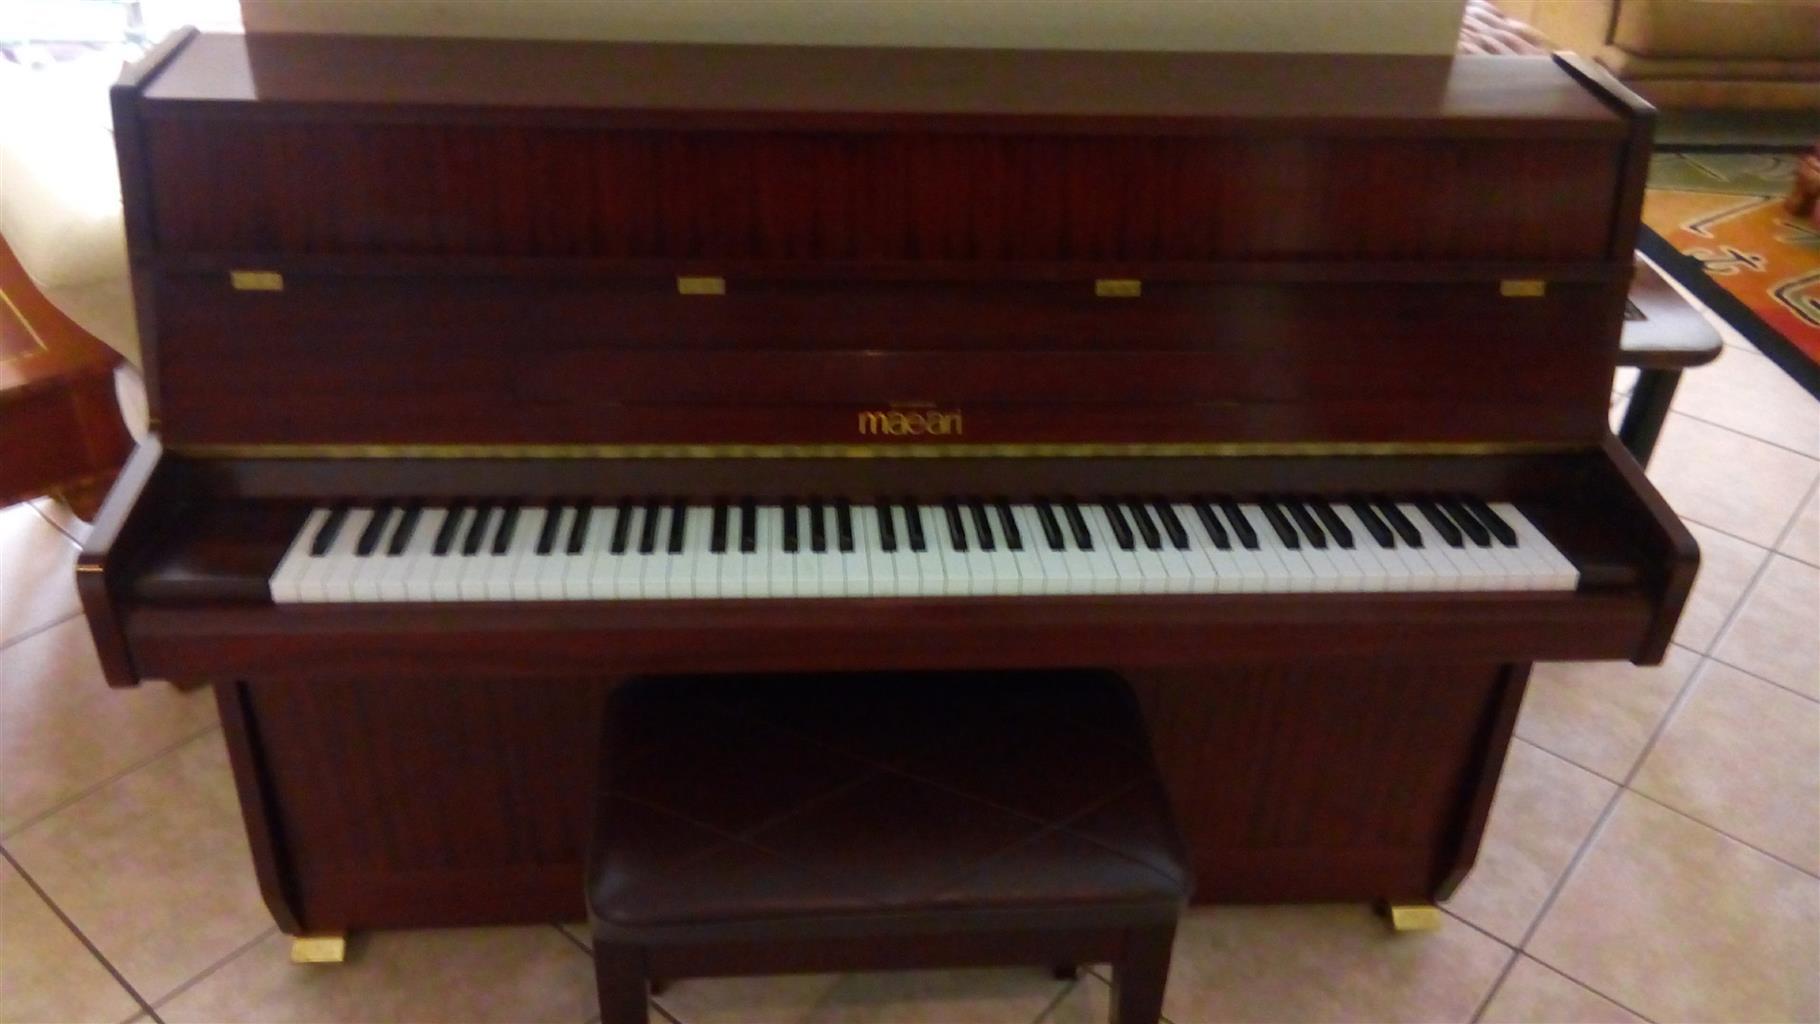 Pre-owned Maeari upright piano